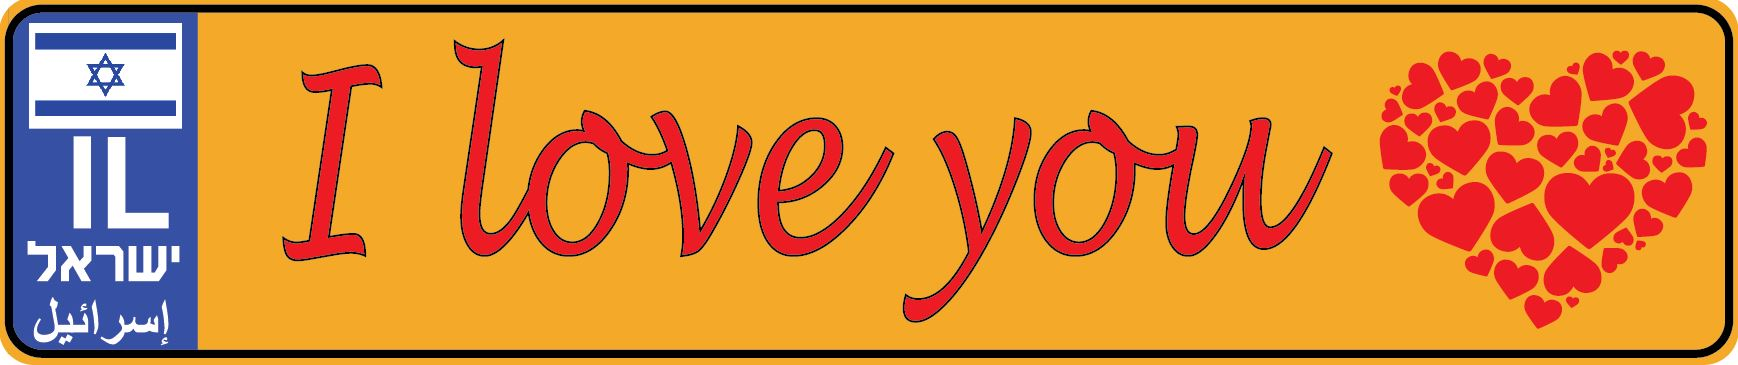 G1008  לוחית רישוי 11/52 ס''מ I LOVE YOU